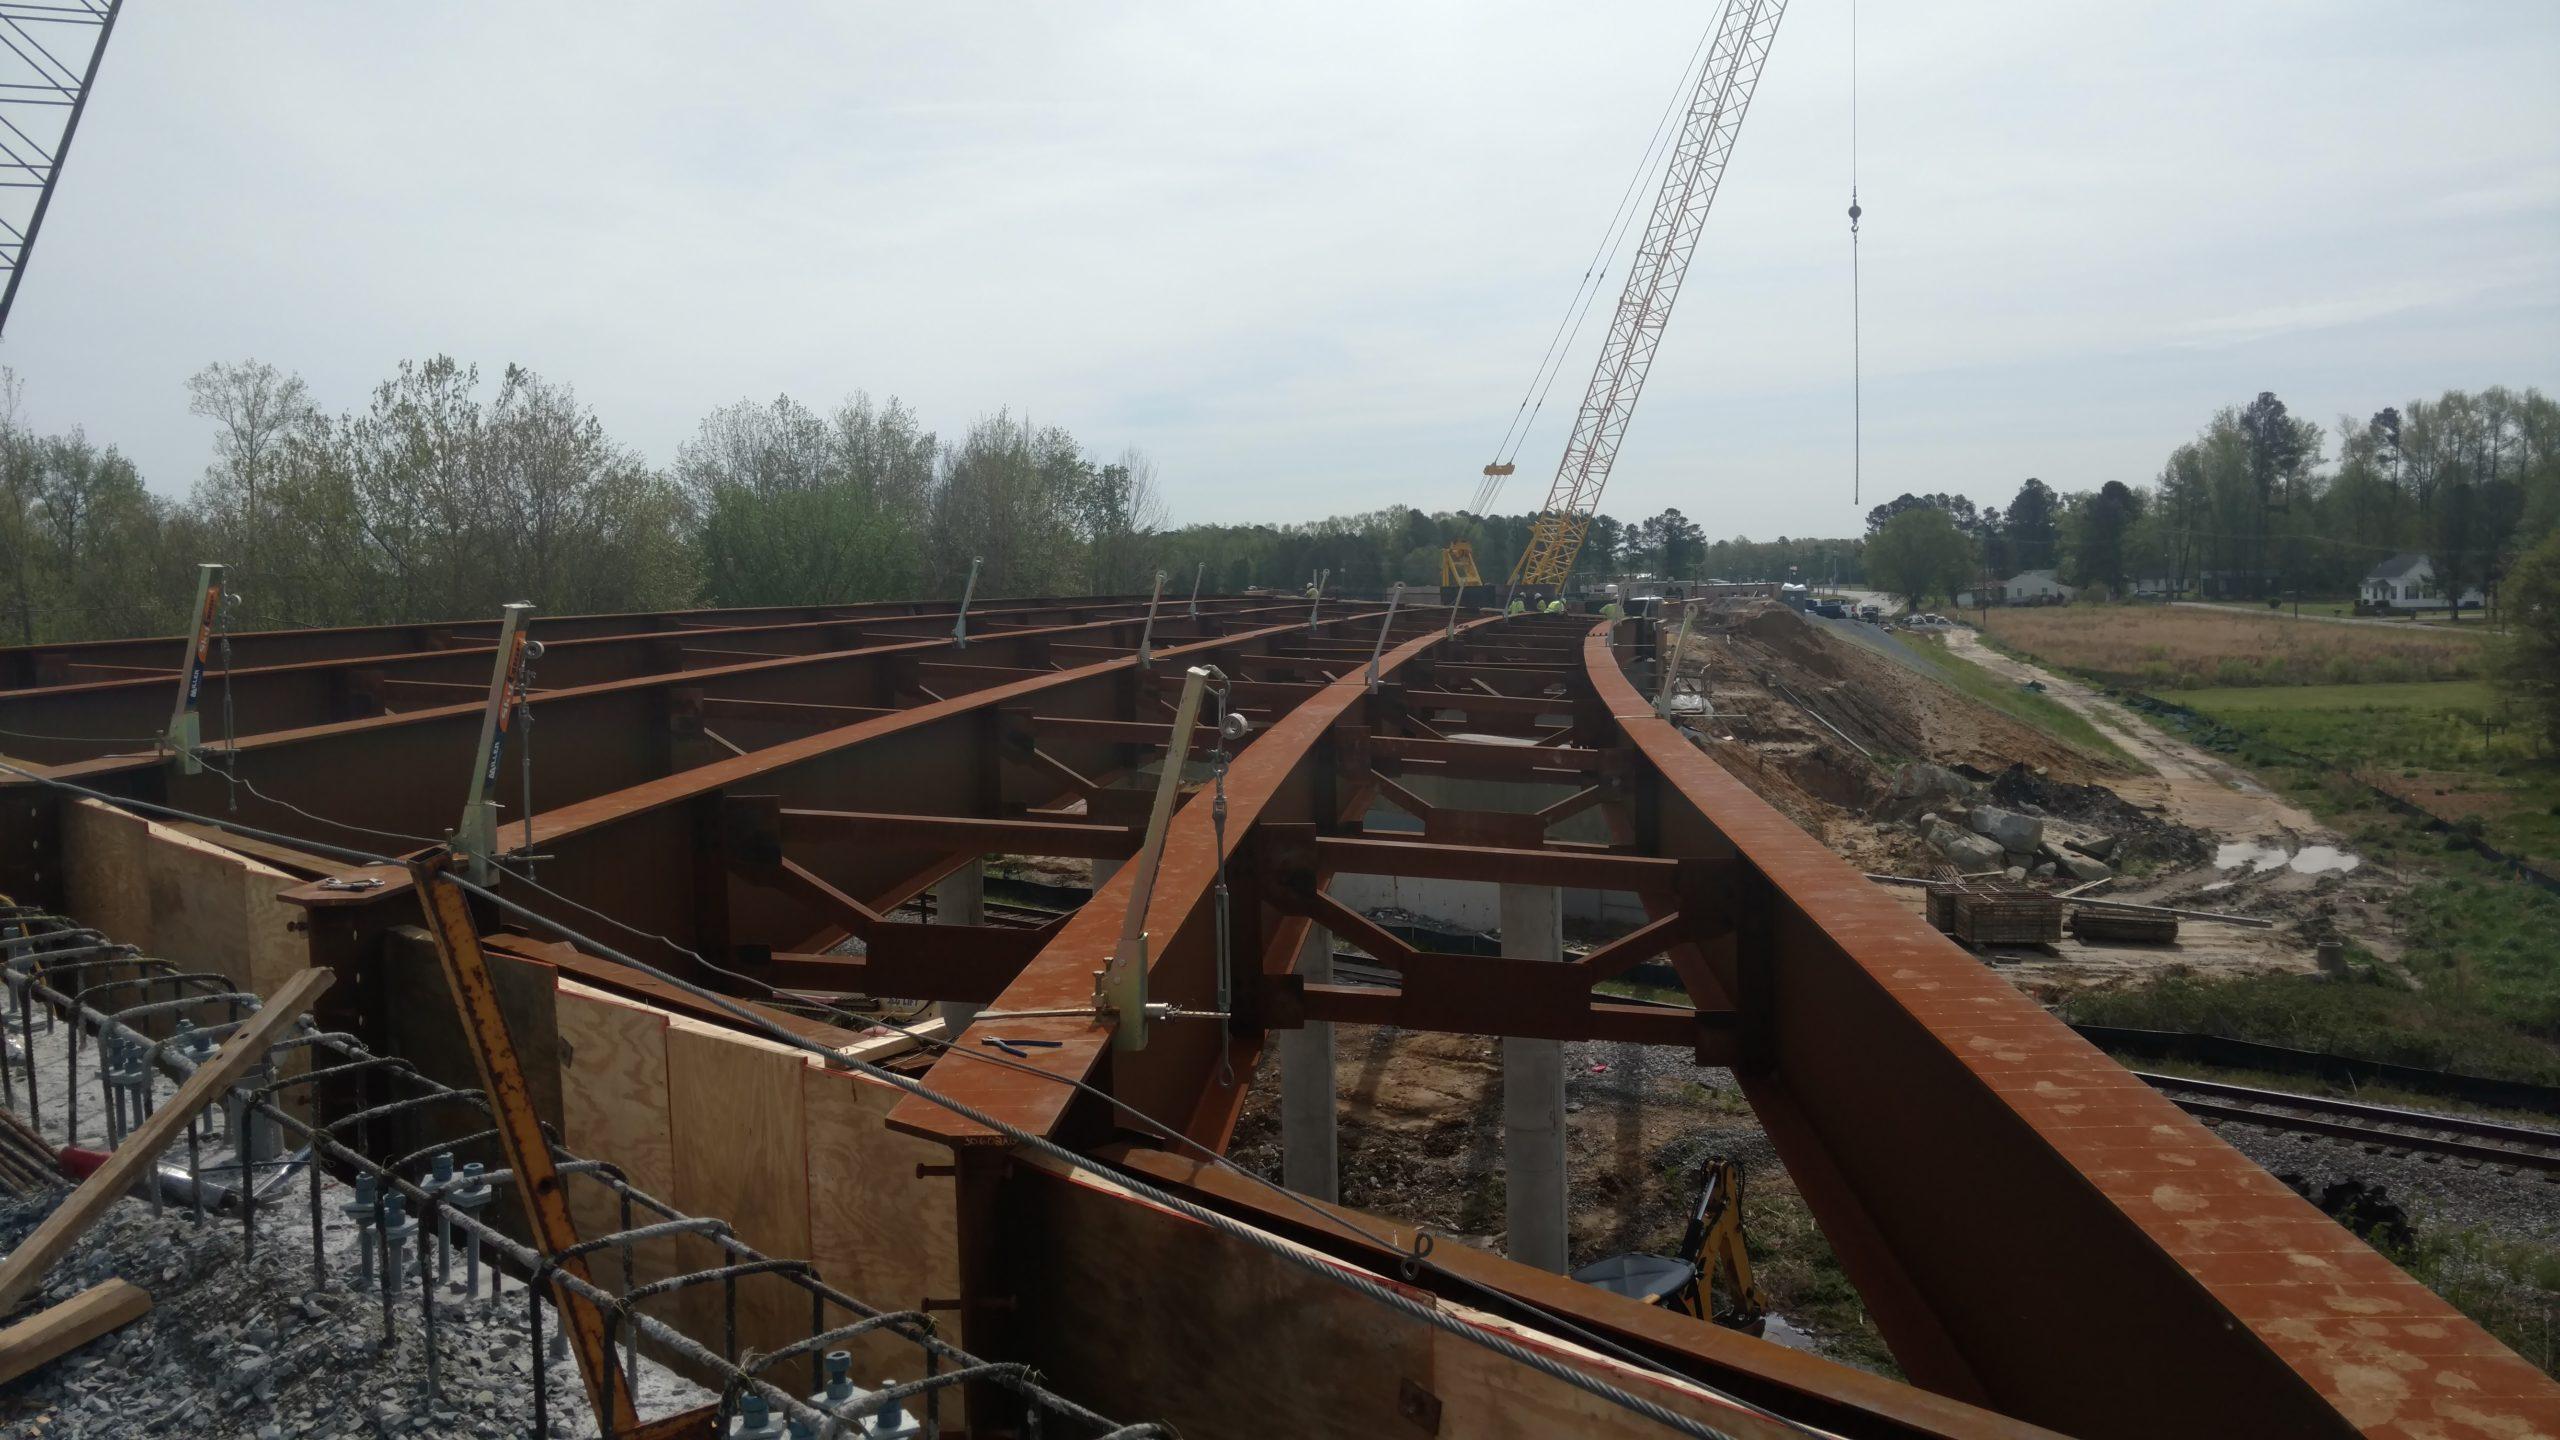 Curved steel girders